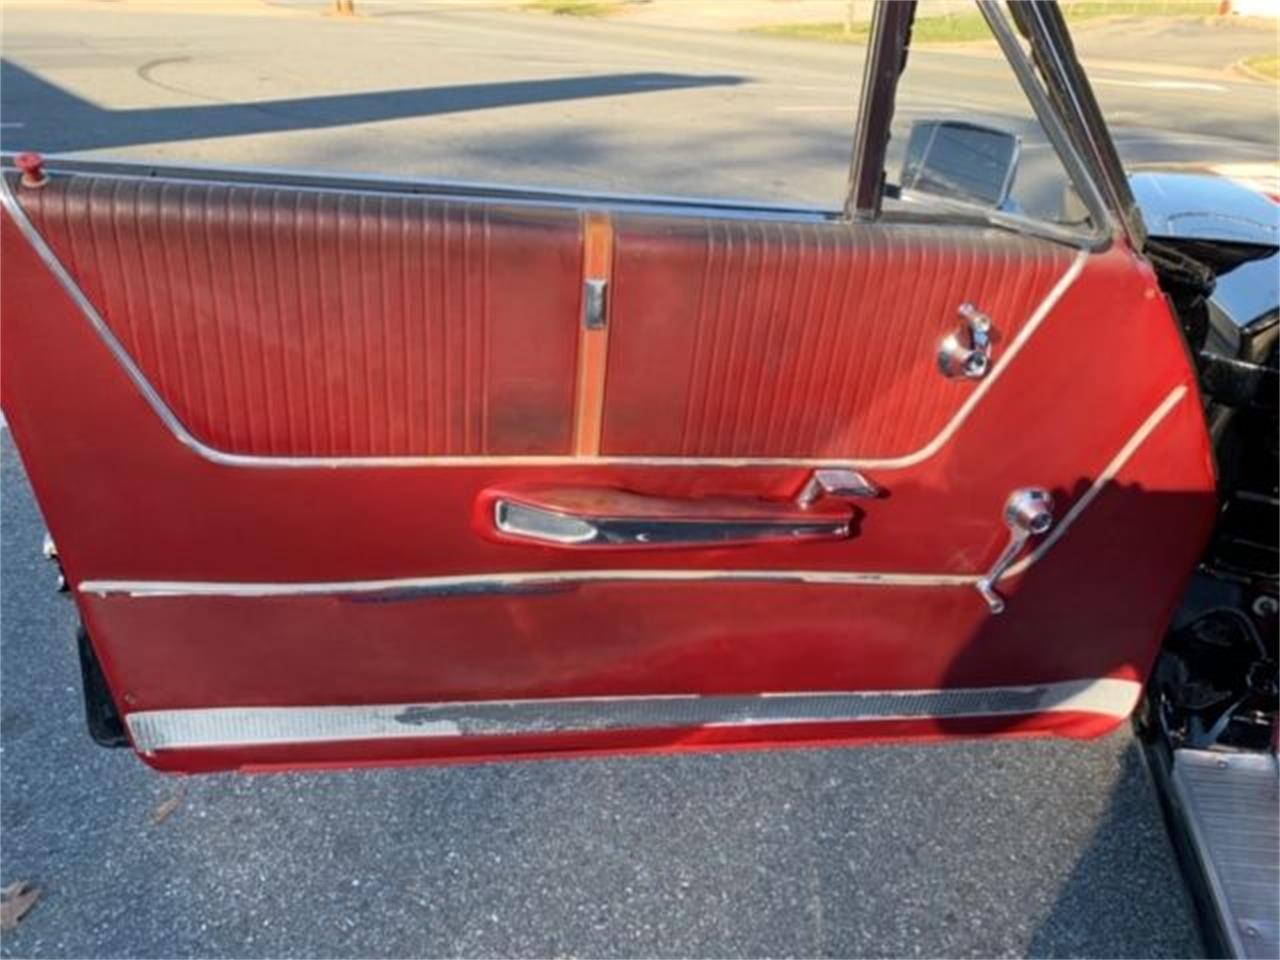 1964 Ford Galaxie 500 (CC-1293740) for sale in Cadillac, Michigan